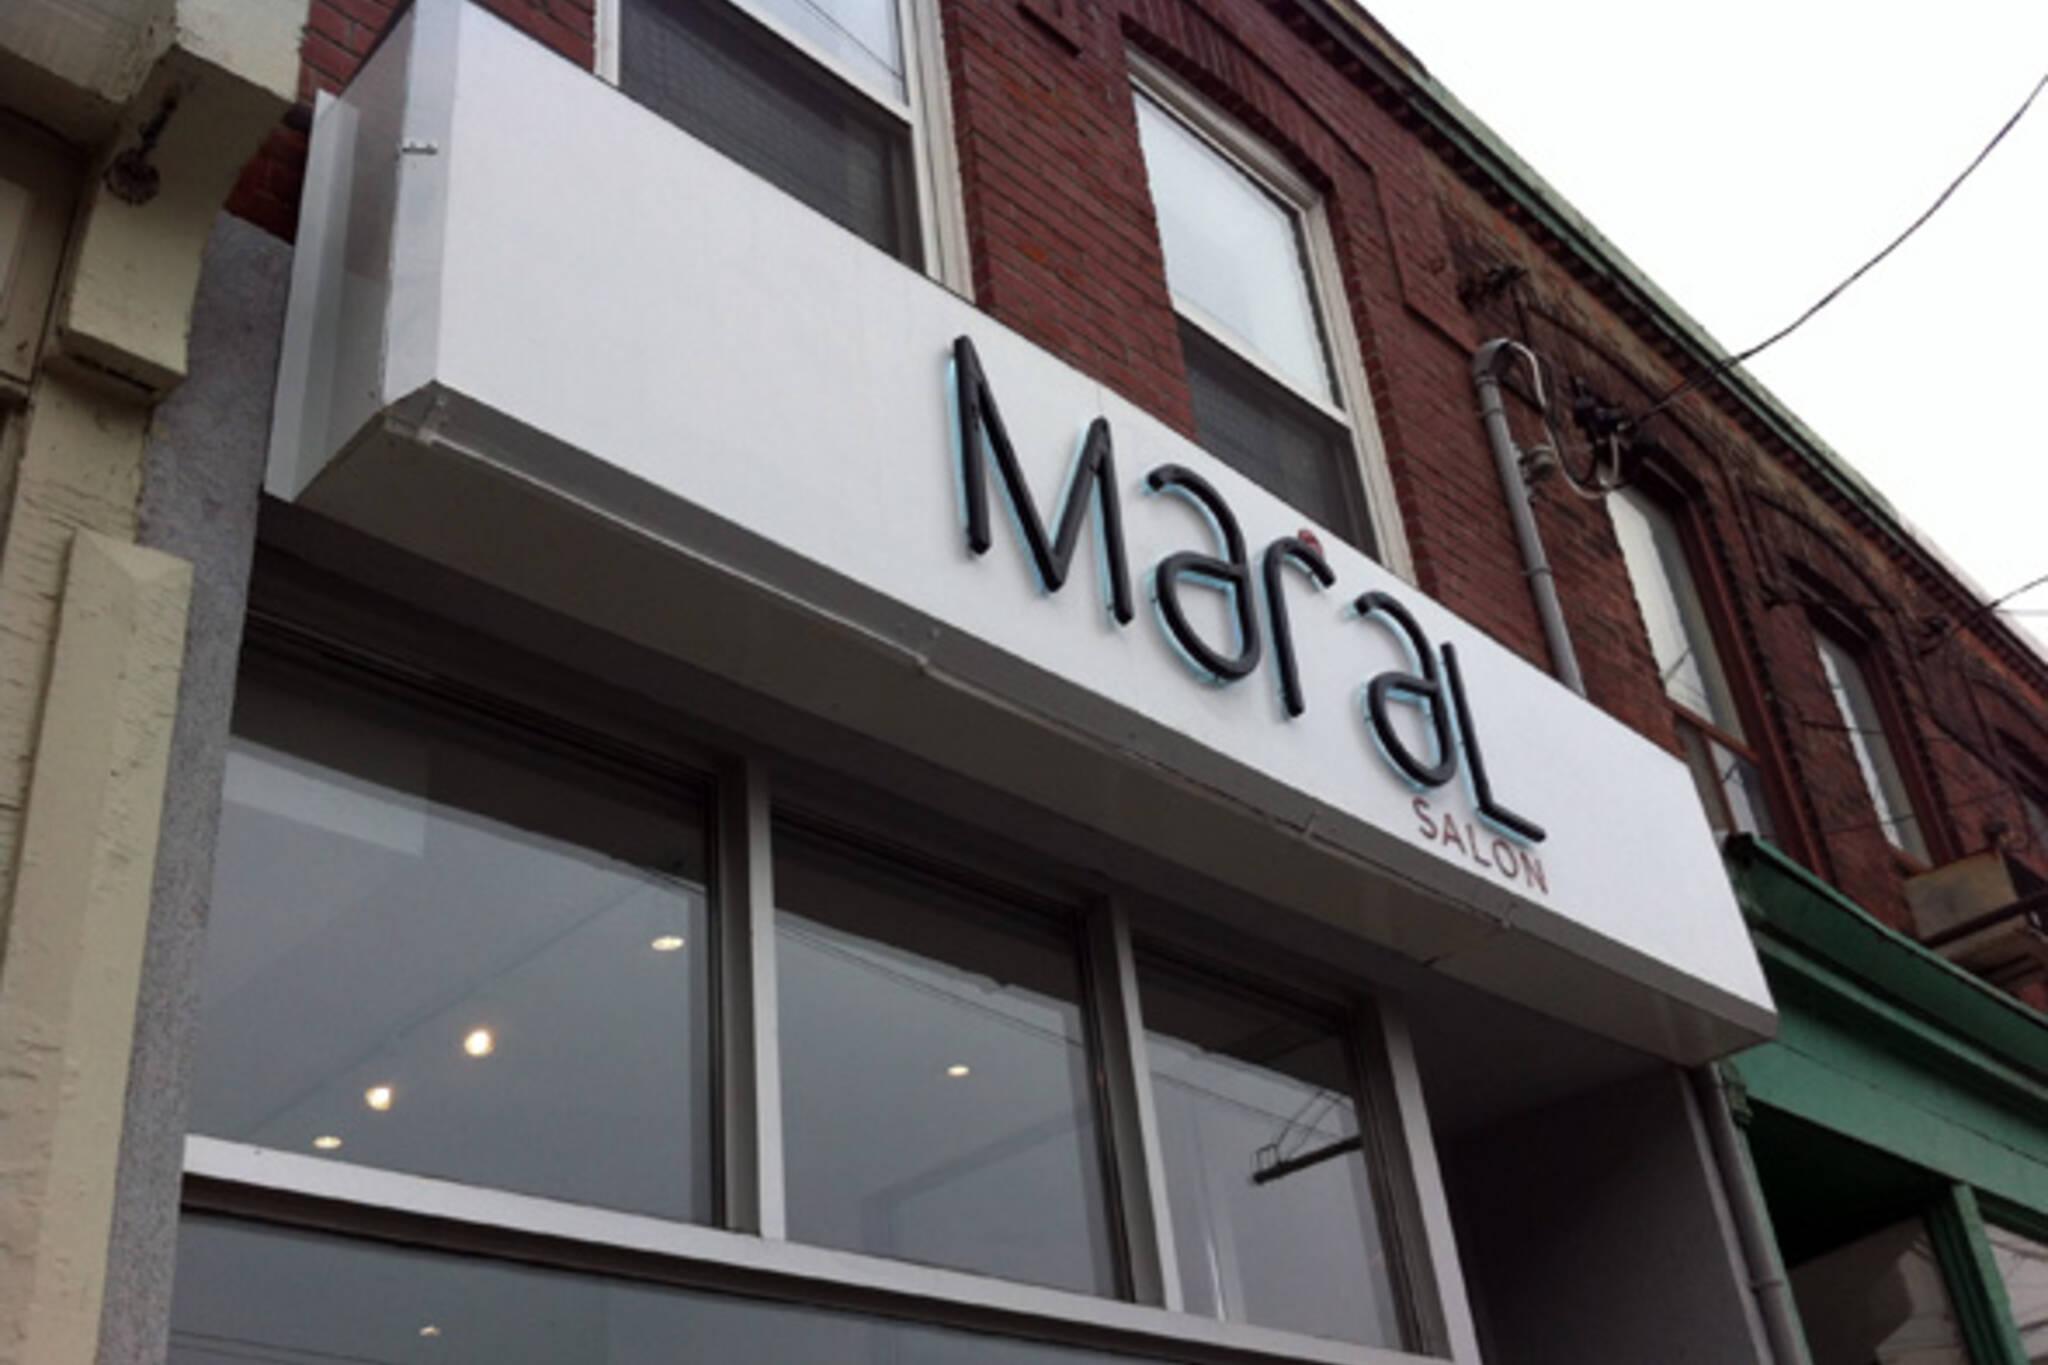 Maral Salon